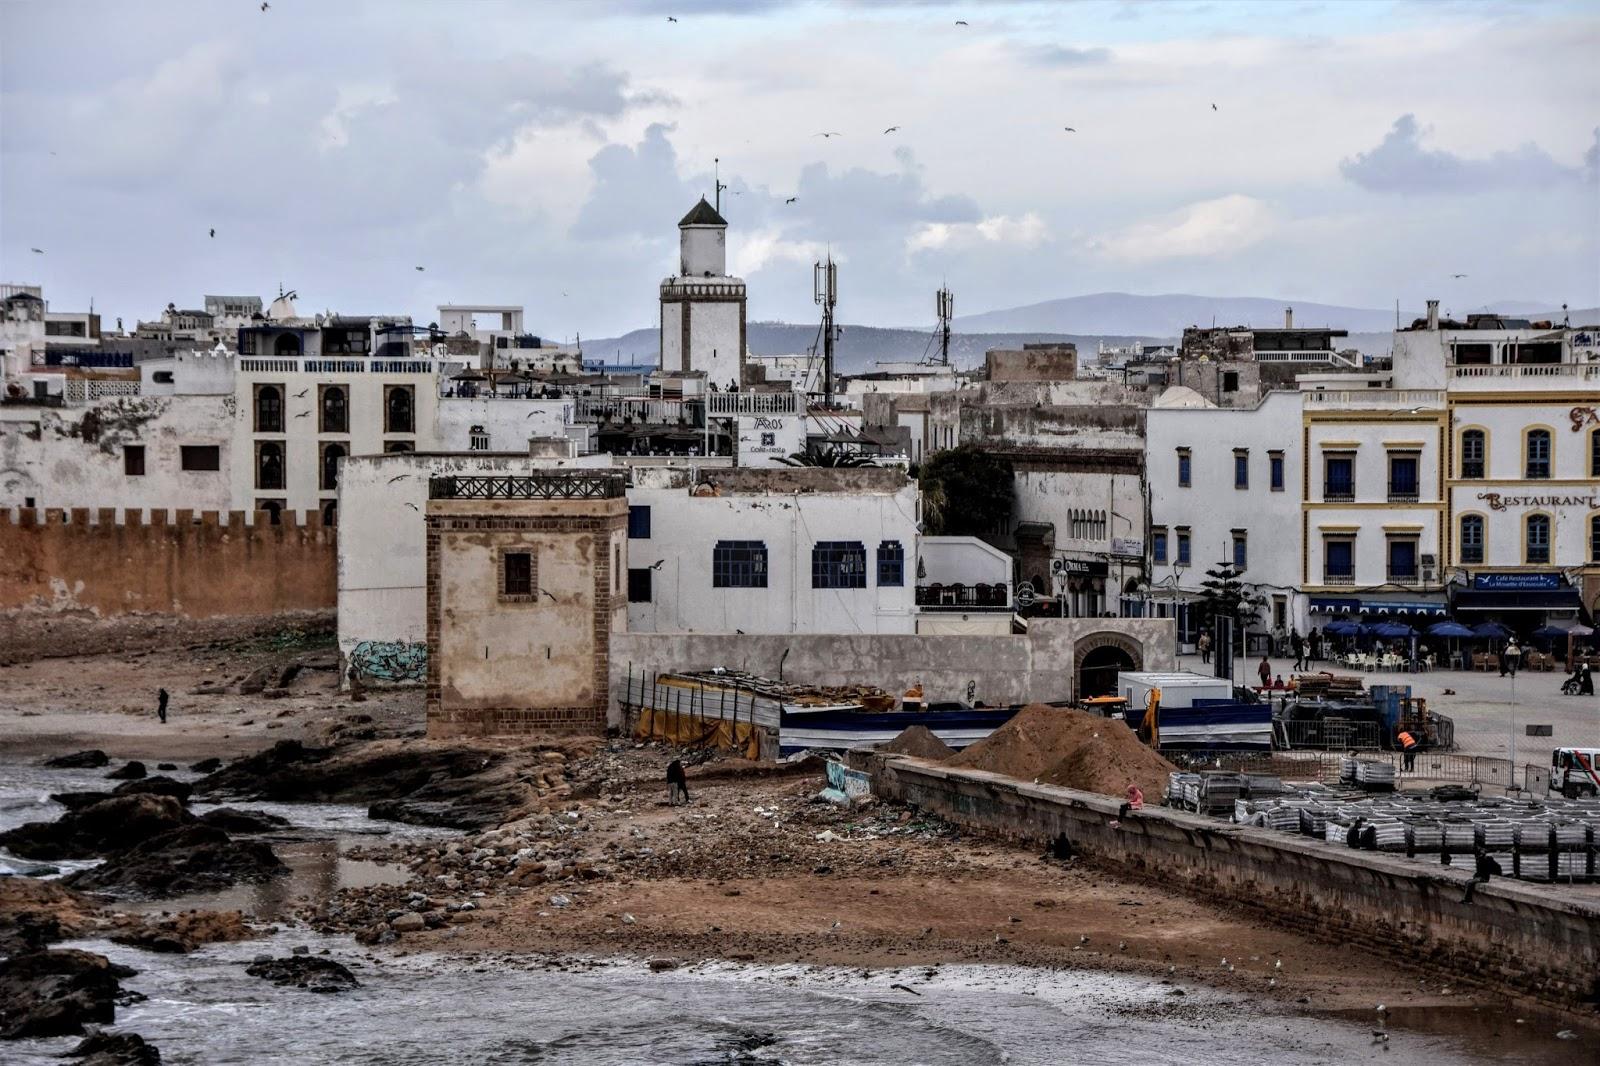 Mogador (Essaouira, As-Suwajra, الصويرة, Aṣ-Ṣuwayra, ṣ-Ṣwiṛa, ⵜⴰⵚⵚⵓⵔⵜ, Taṣṣurt) / Morocco (Maroko, ⵜⴰⴳⵍⴷⵉⵜ ⵏ ⵍⵎⵖⵔⵉⴱ, المملكة المغربية, Al-Mamlaka al-Maghribijja